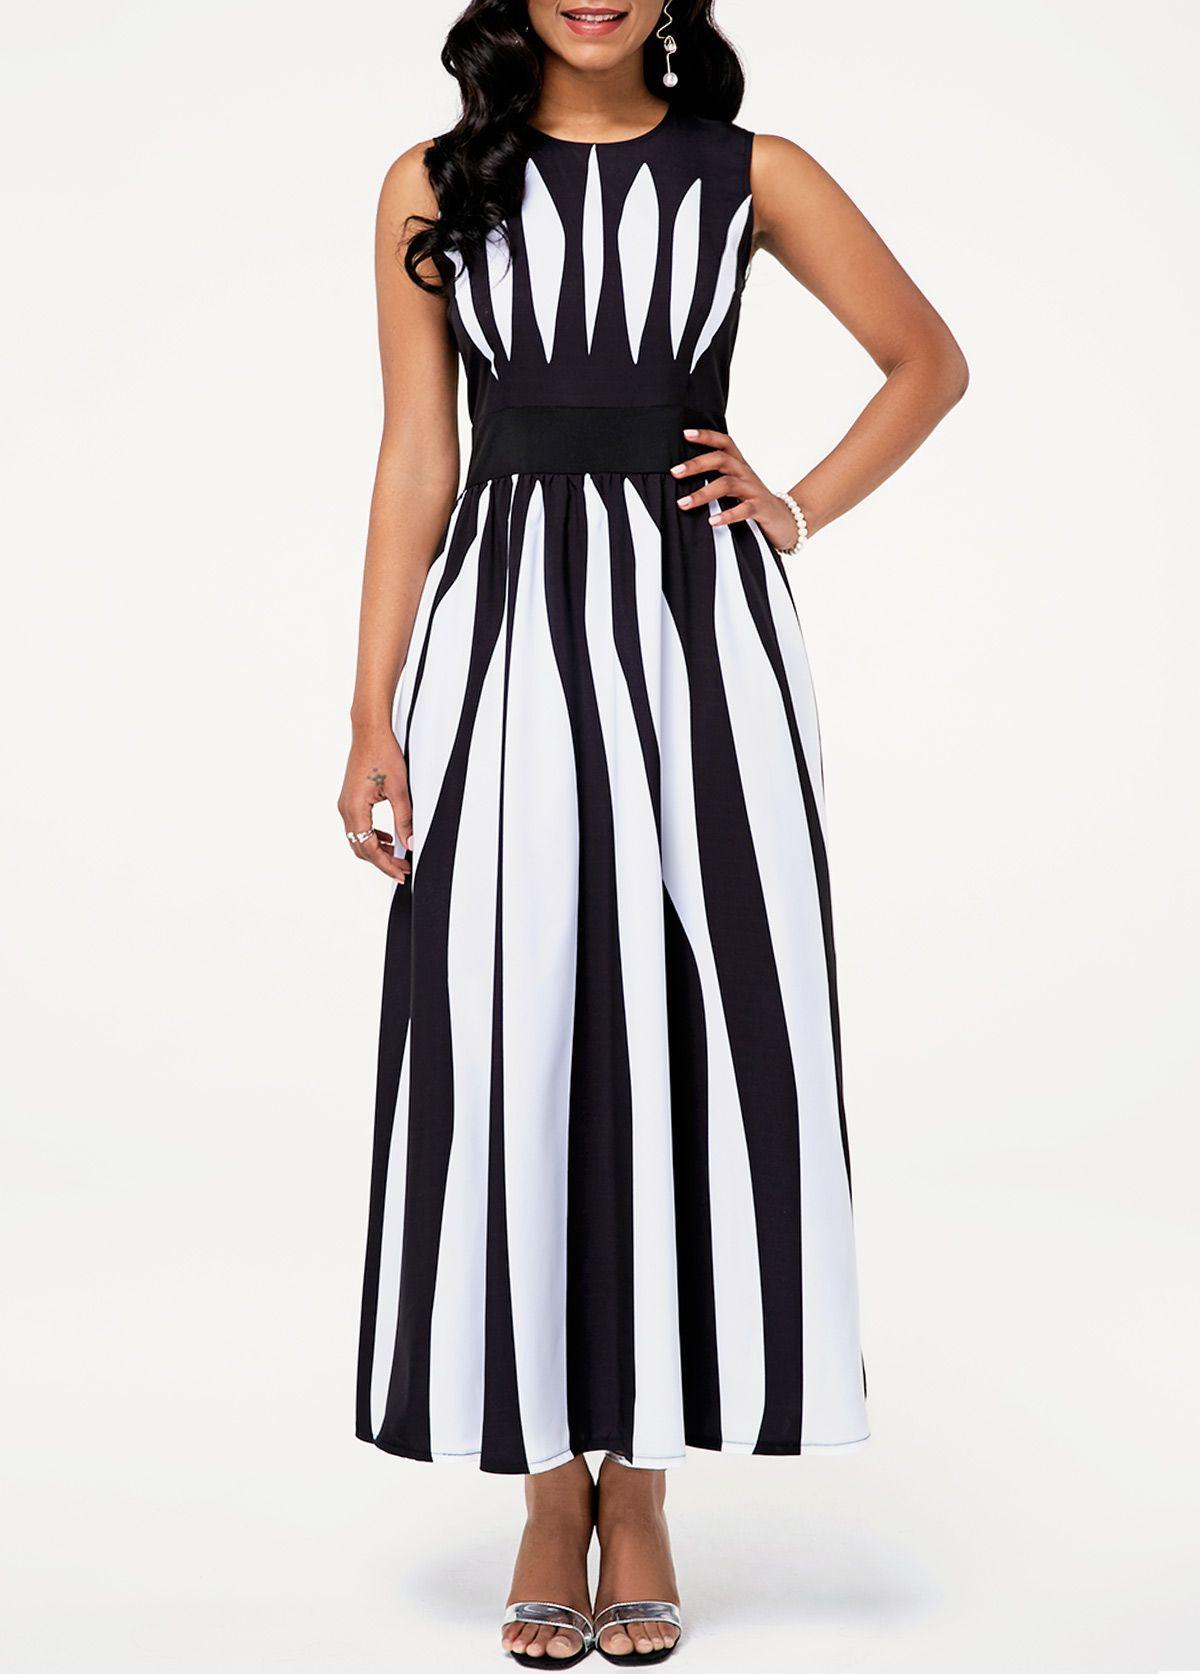 8c3097b229b Round Neck Sleeveless High Waist Stripe Print Dress